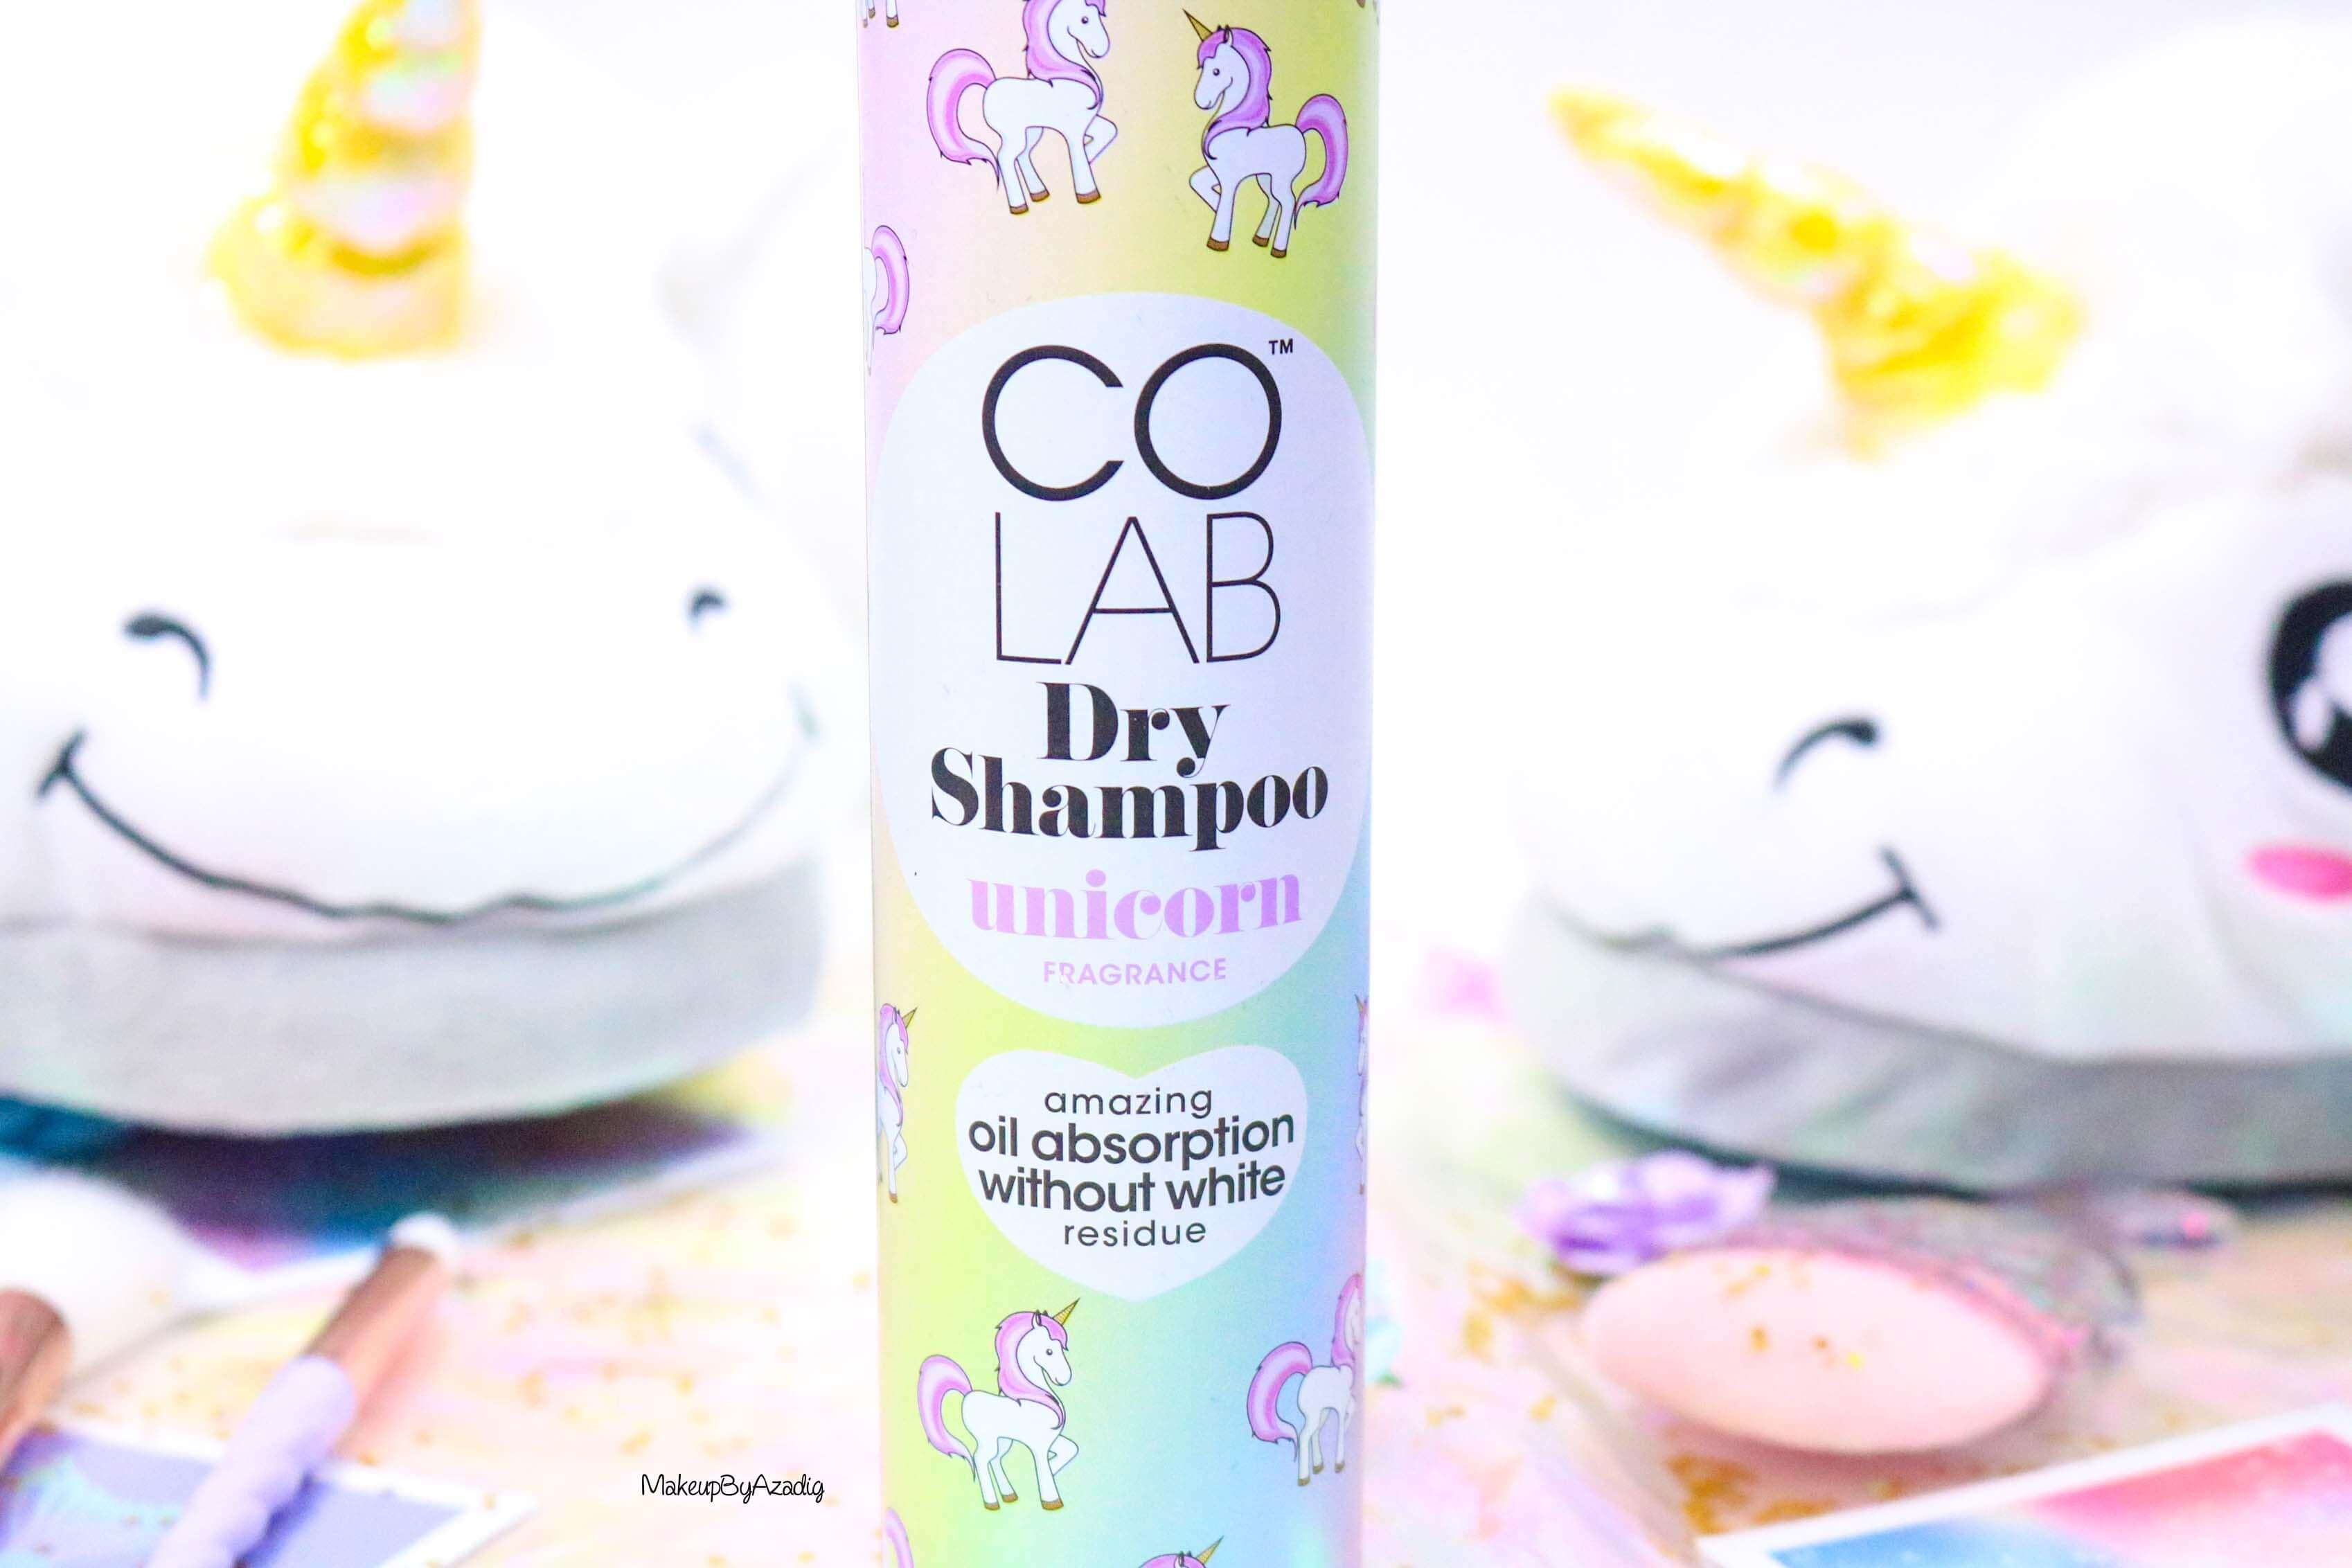 revue-shampooing-sec-colab-batiste-fresh-unicorn-monoprix-feelunique-prix-avis--soin-capillaire-efficacite-makeupbyazadig-unicorn